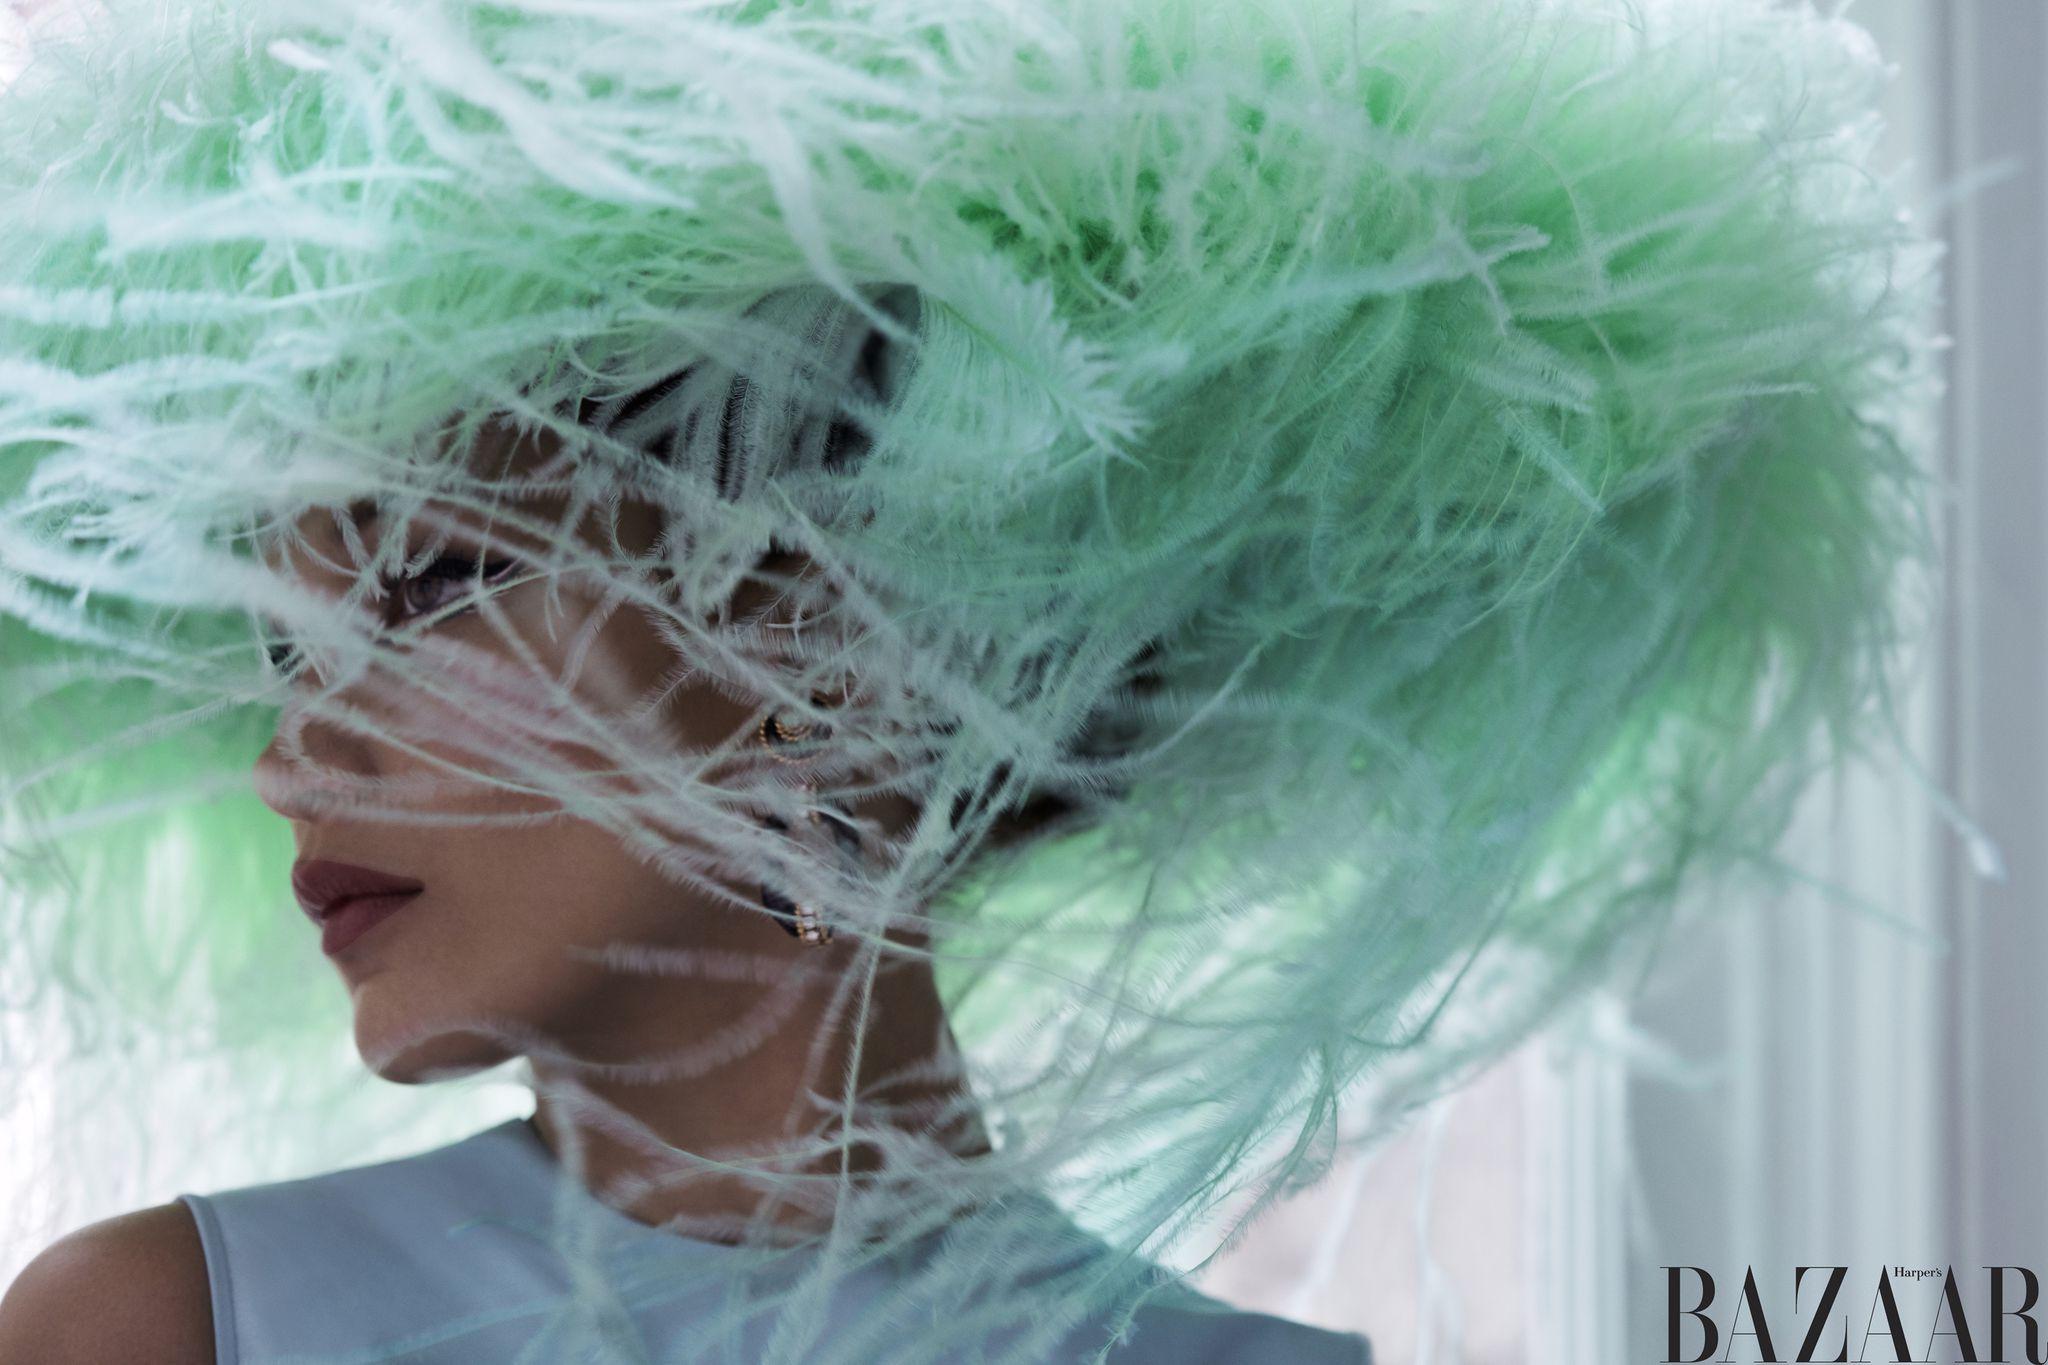 Áo Valentino Haute Couture. Mũ Philip Treacy thiết kế cho Valentino Haute Couture. Hoa tai Van Cleef & Arpels.